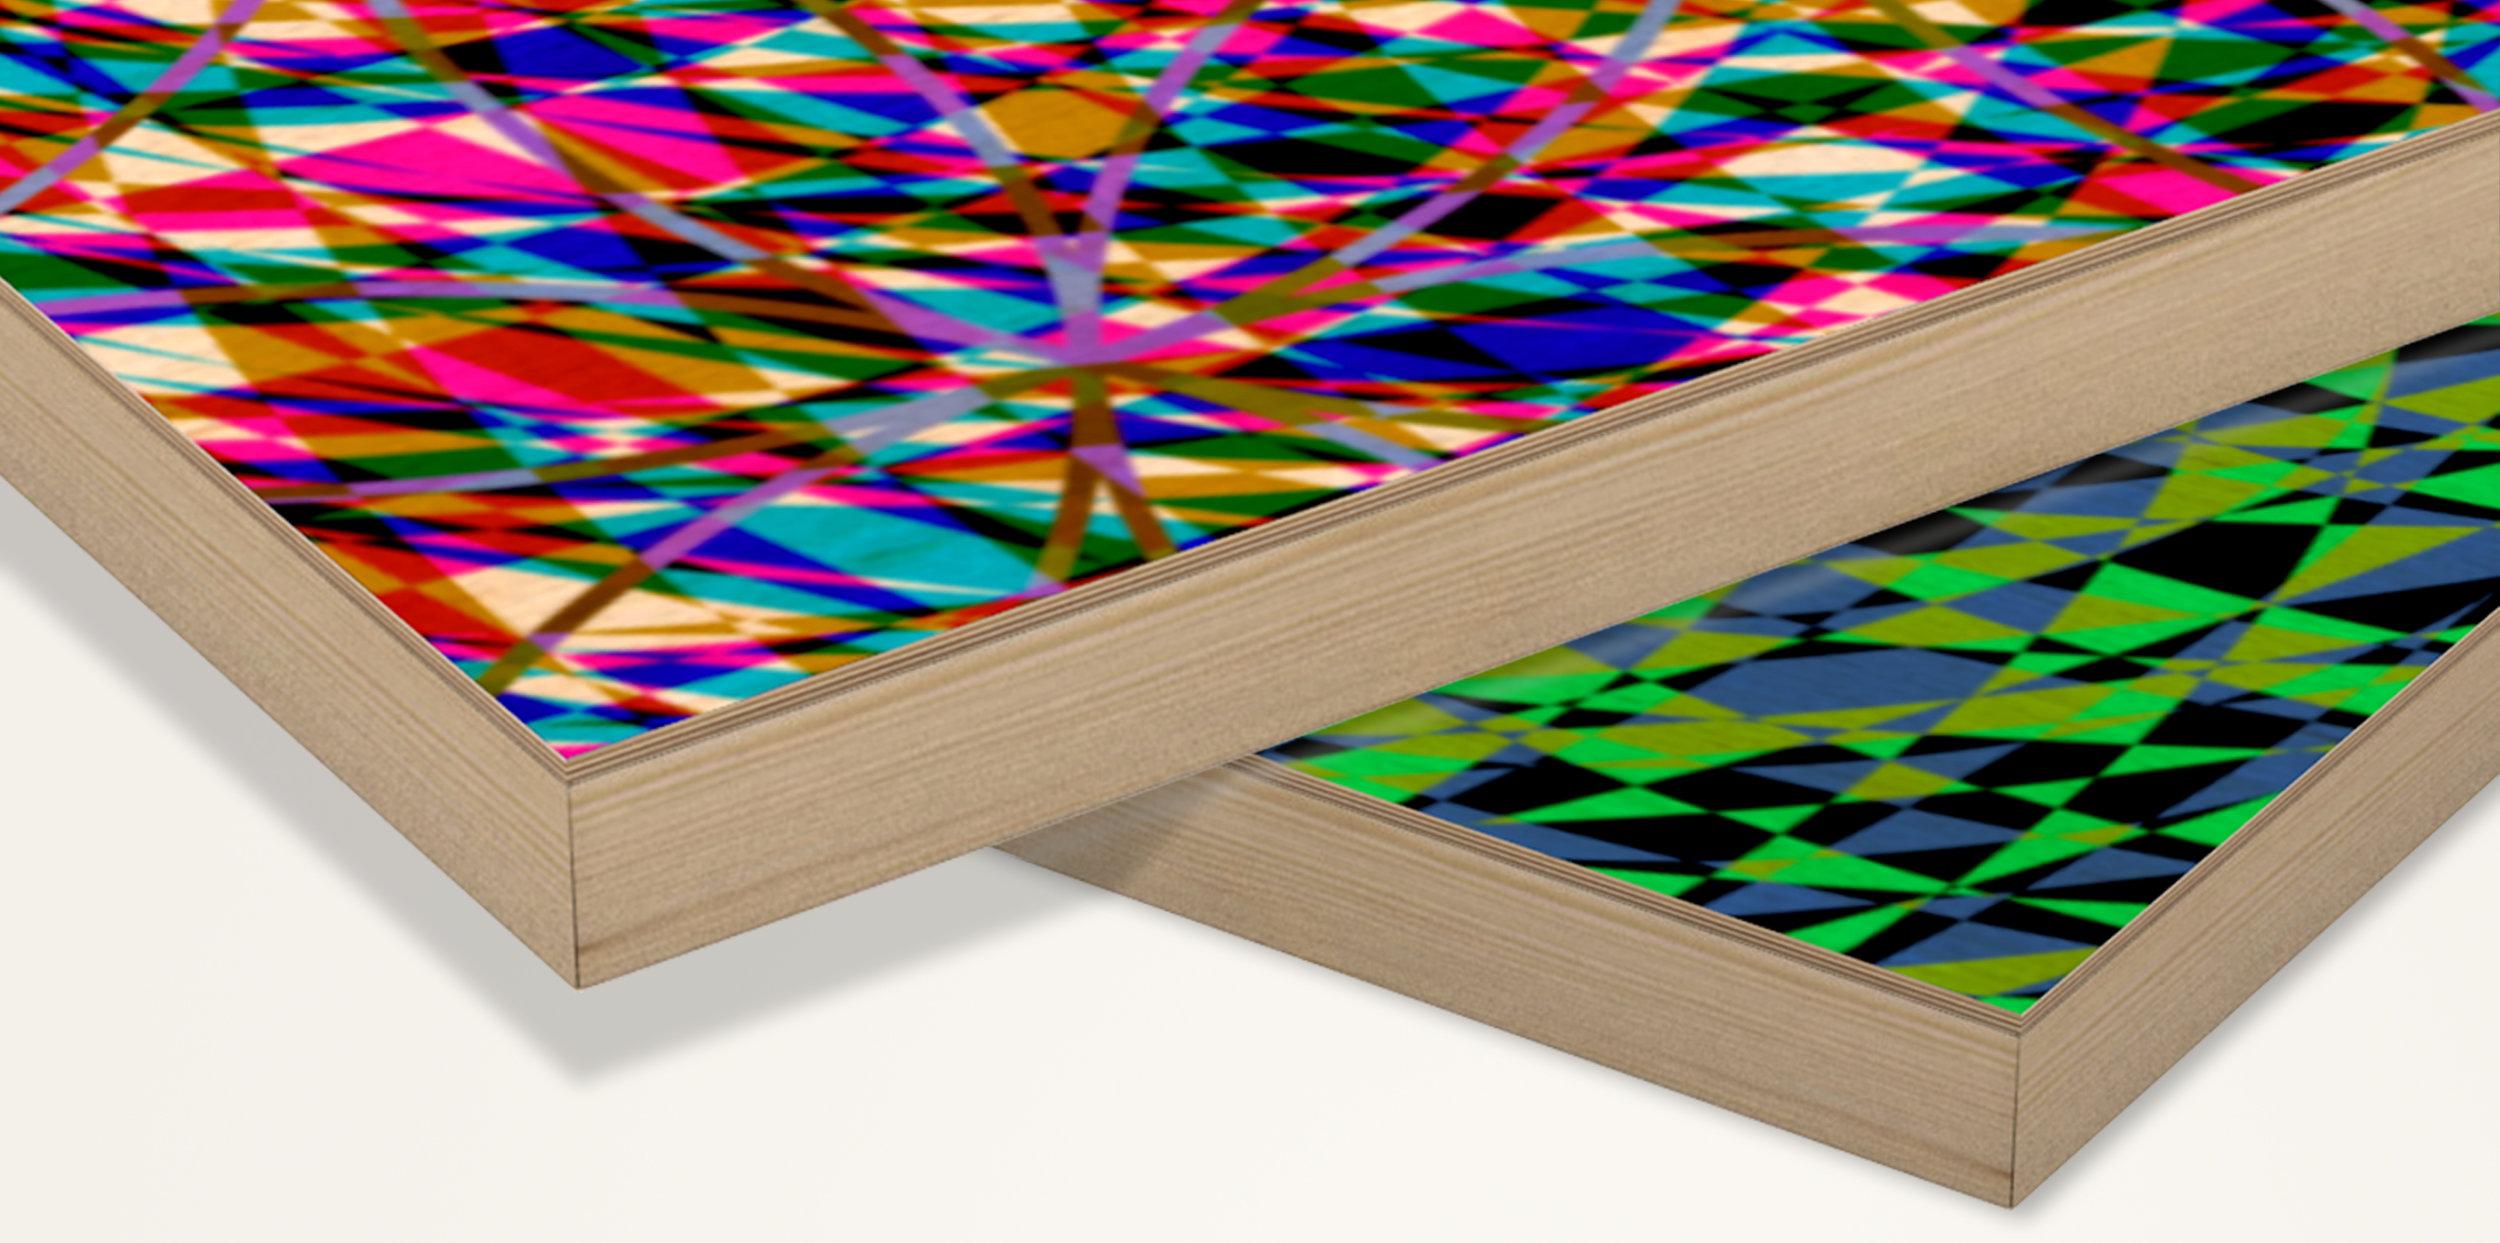 Geometric-Optical-Illusions-Fine-Art-Wood-Prints.jpg